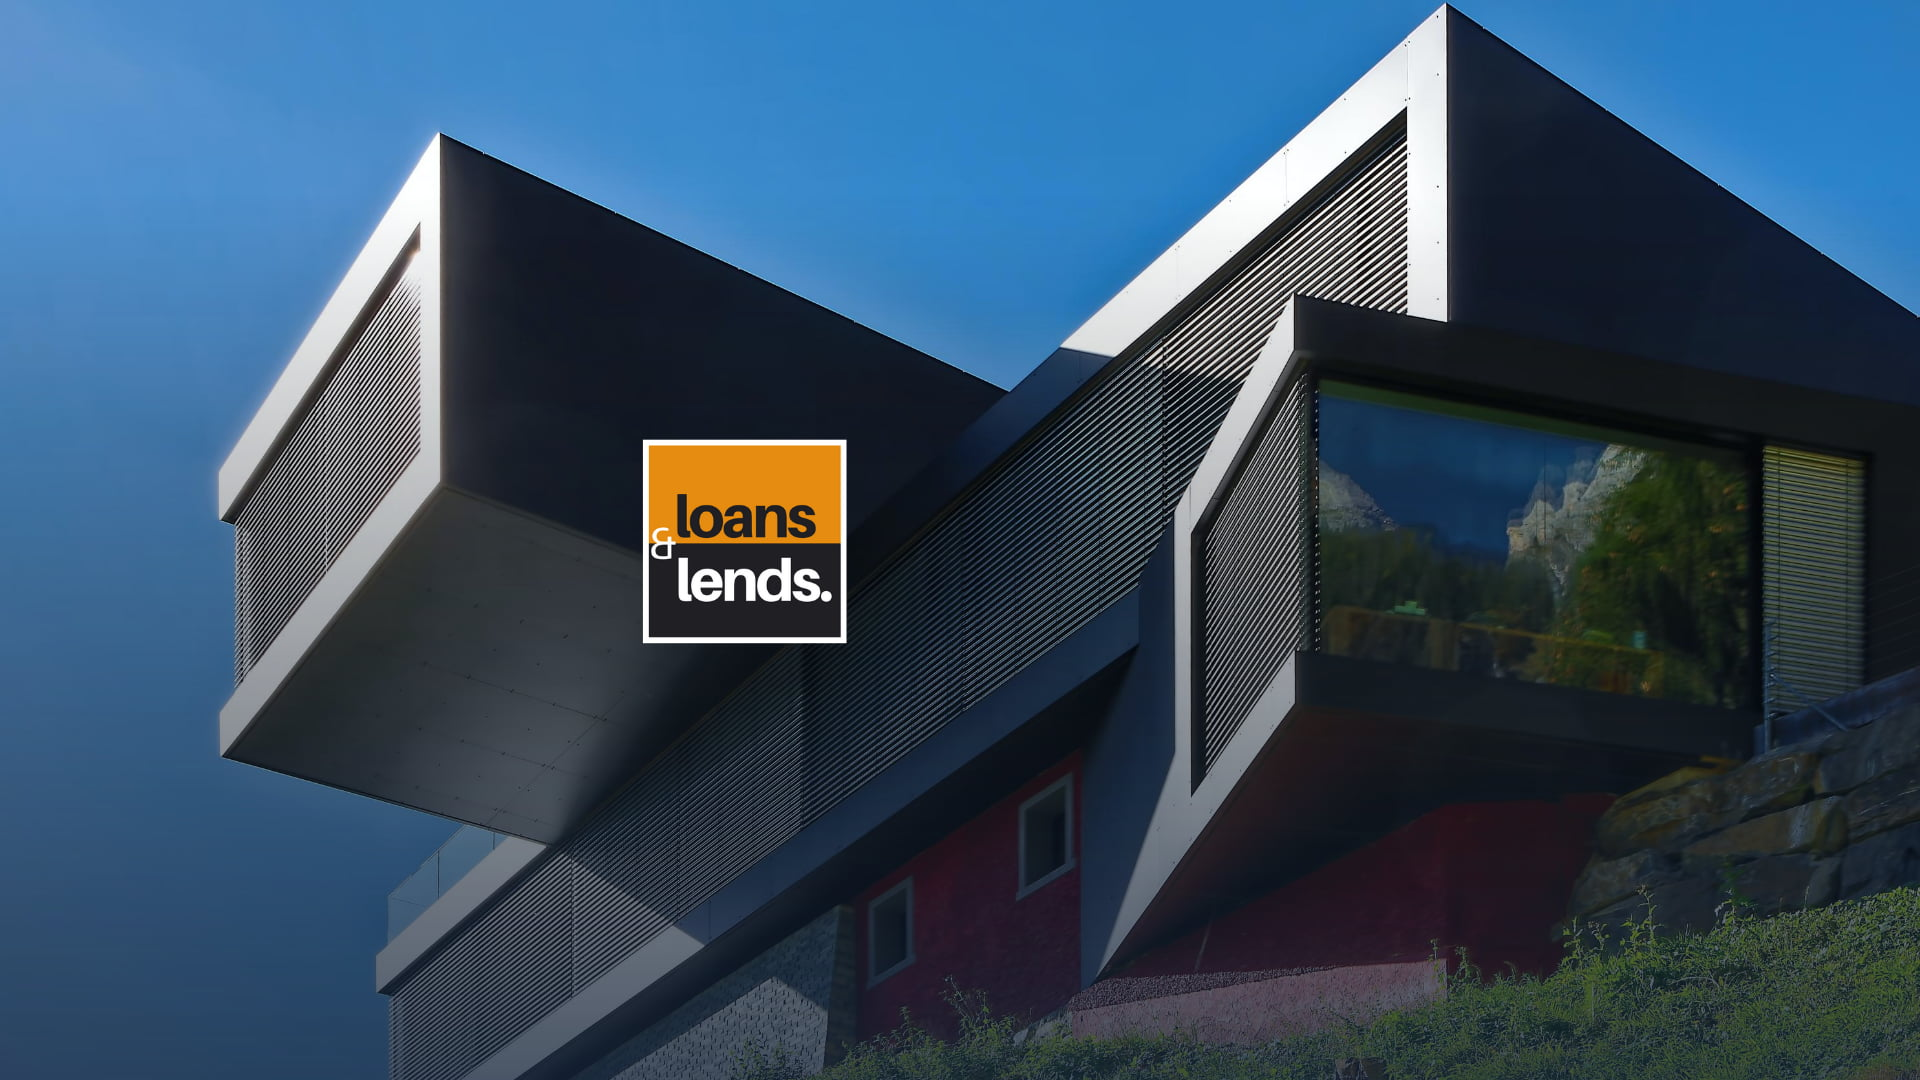 Interakt Client background - Loans and Lends